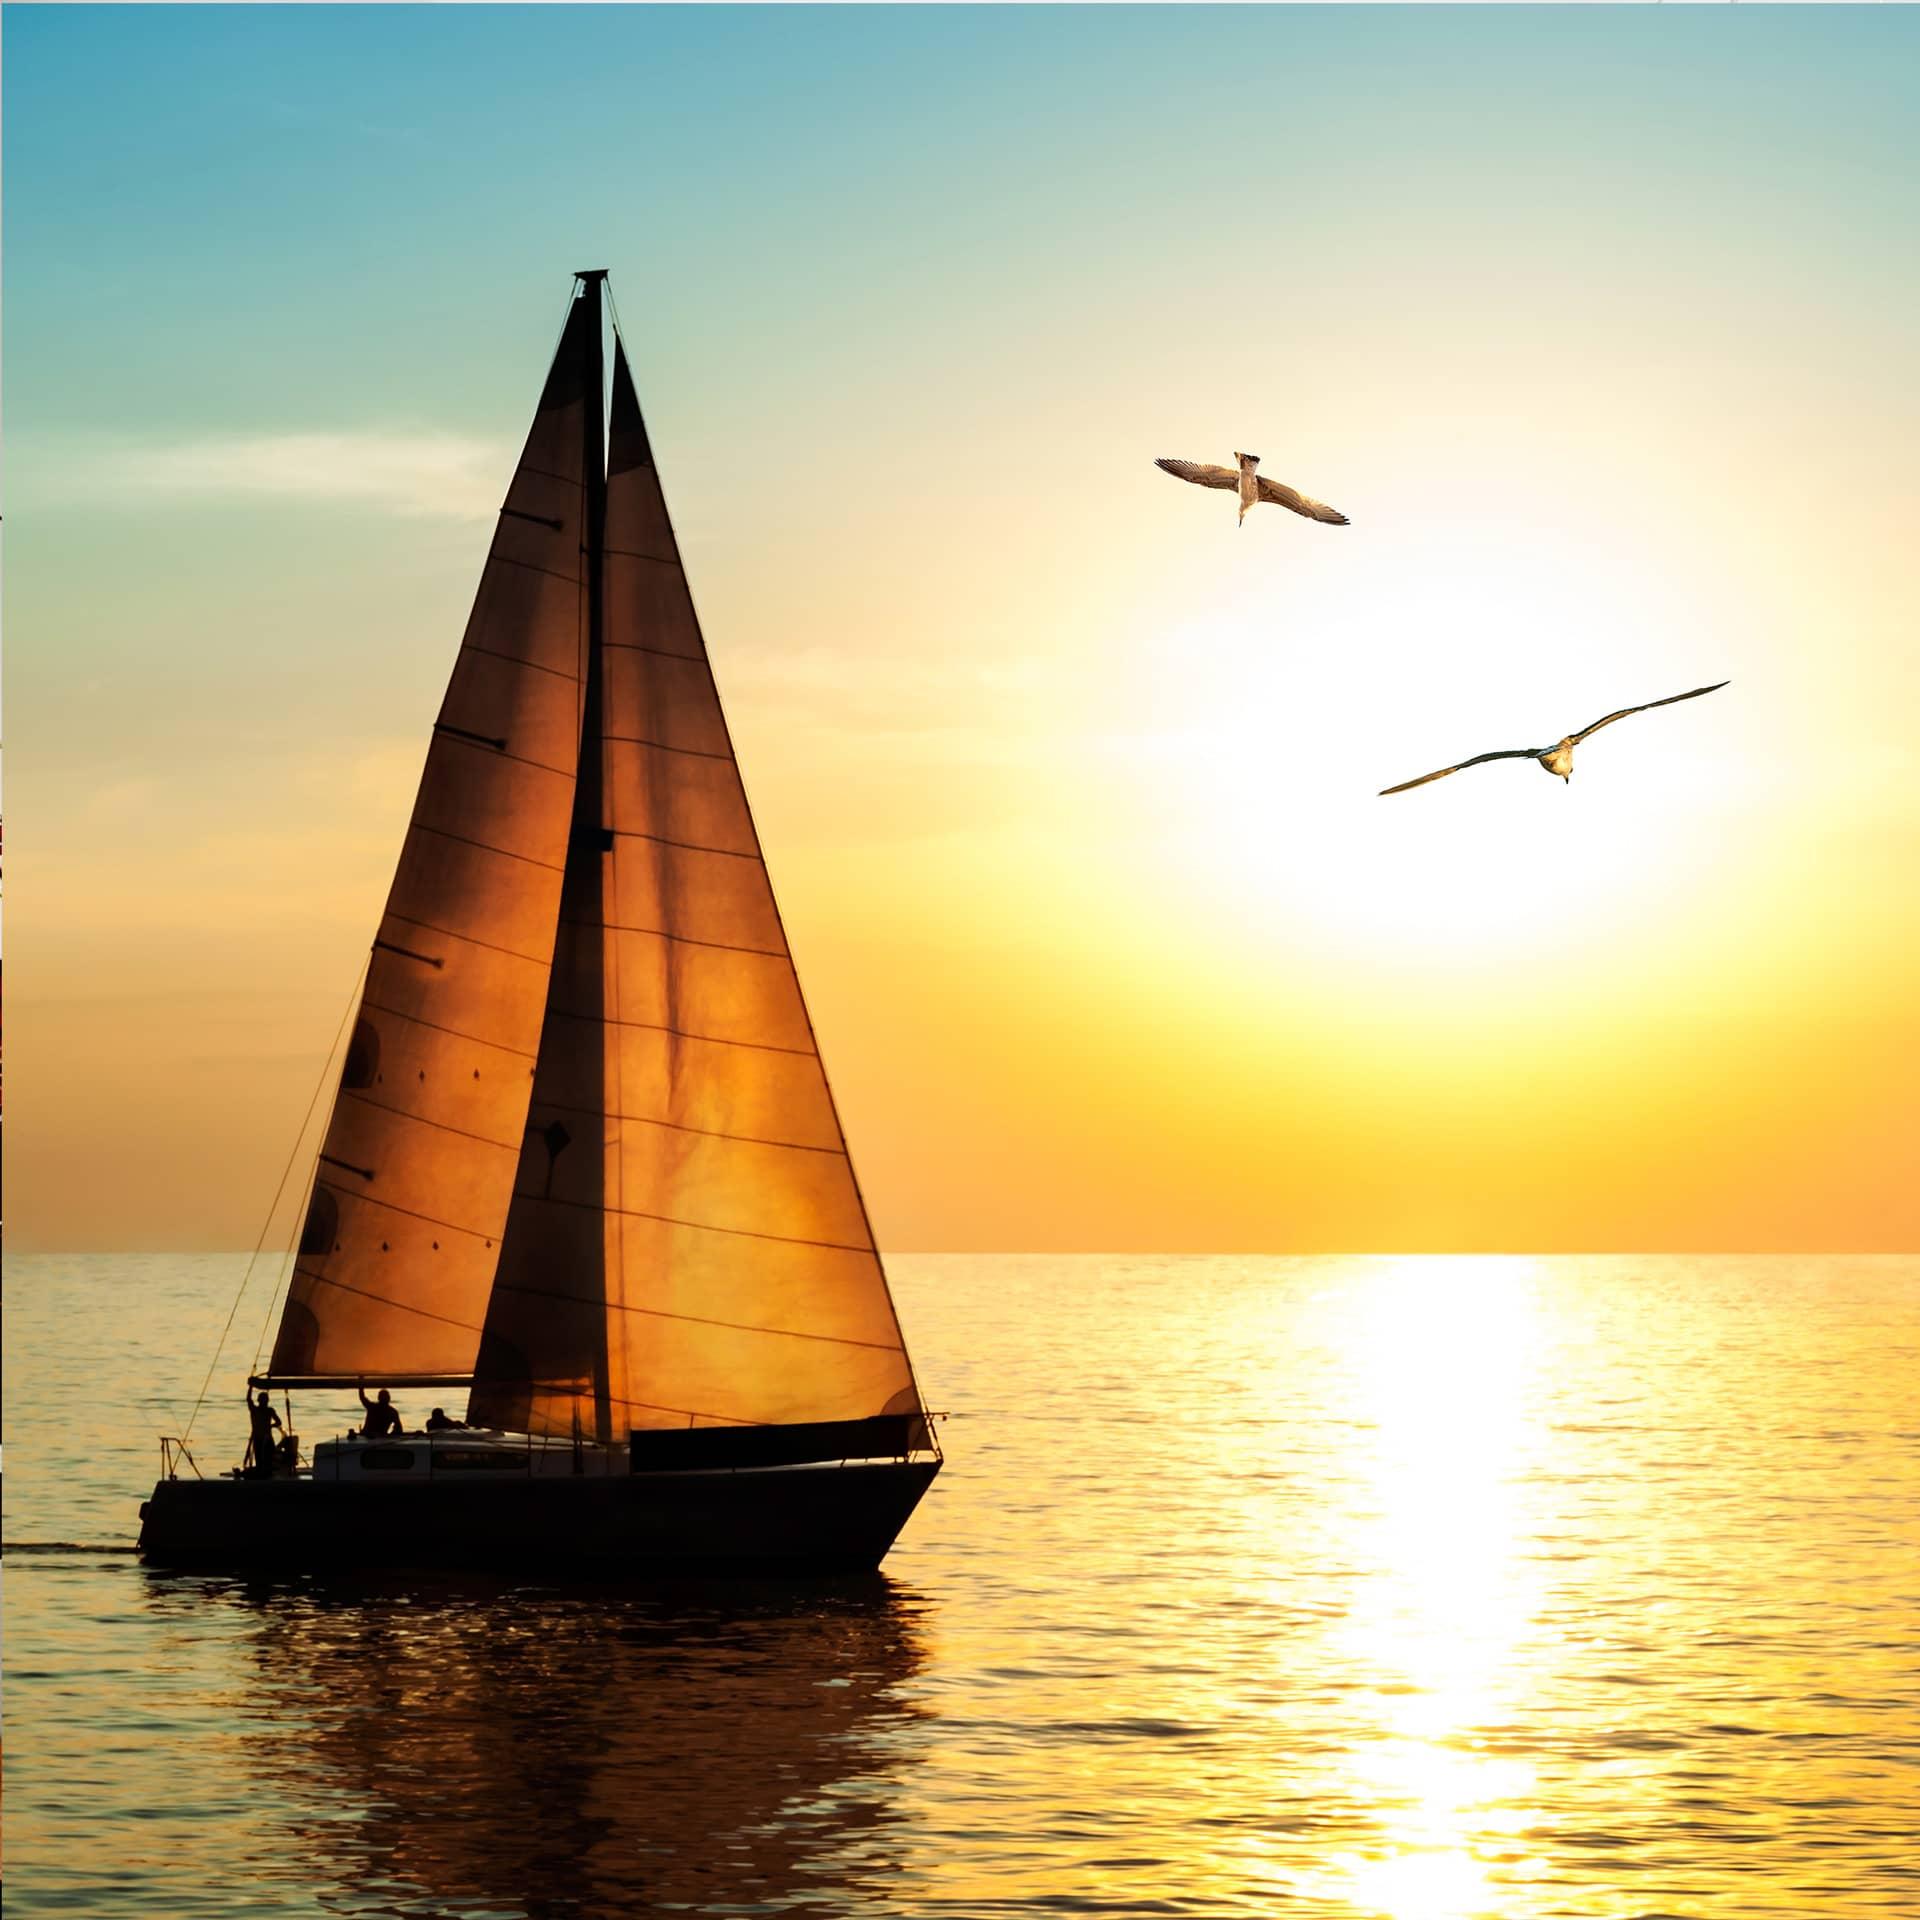 fototapete segelboot im sonnenuntergang - tolle wanddeko für ... - Fototapete 250x250